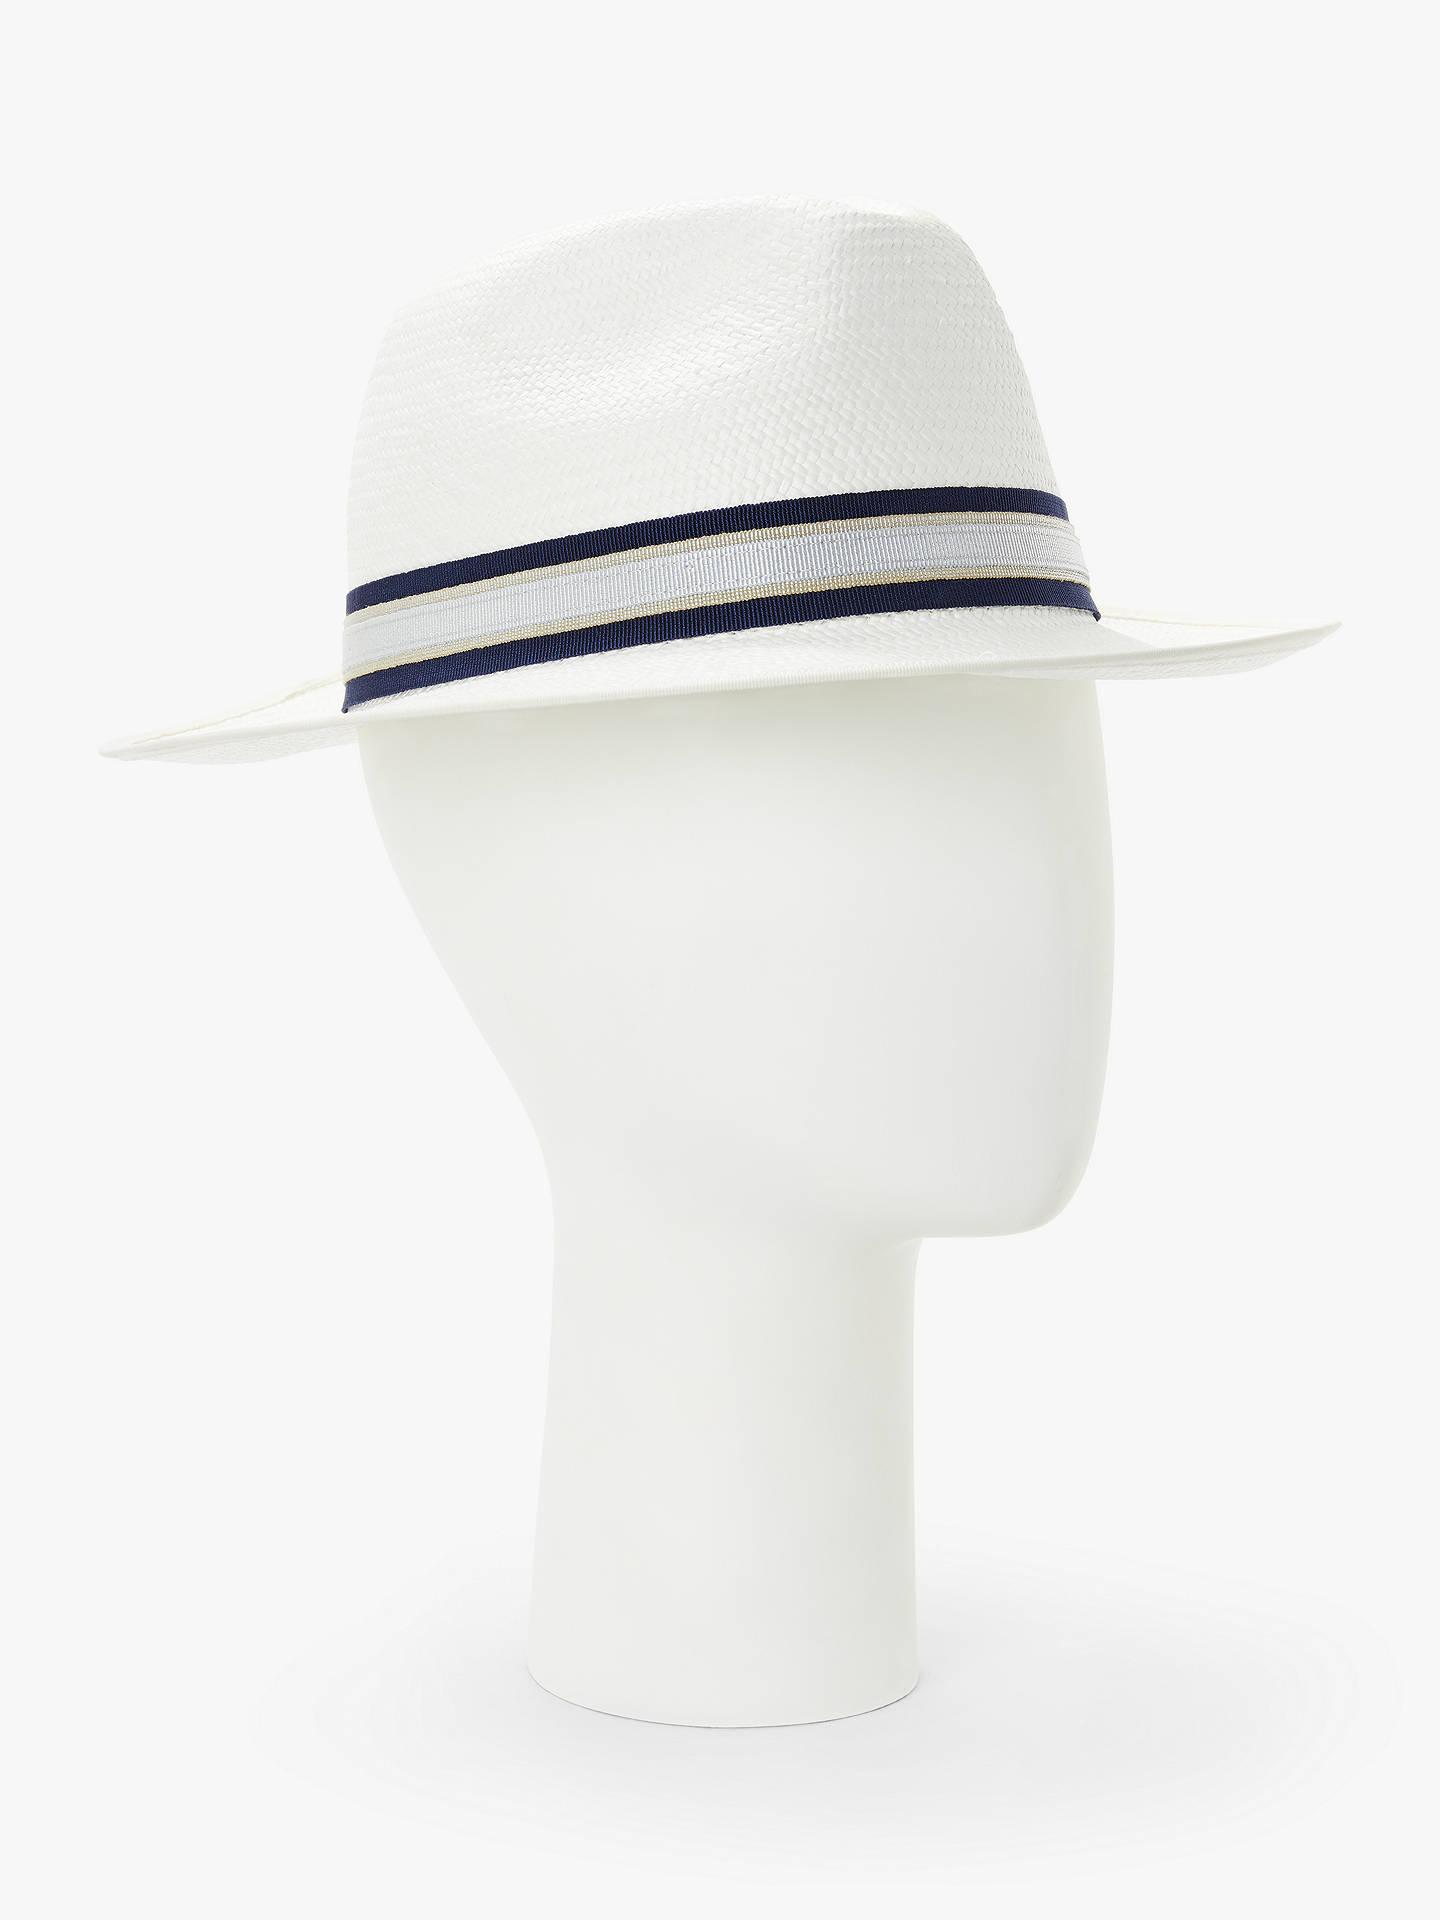 72007204d John Lewis & Partners Christys' Panama Hat, White